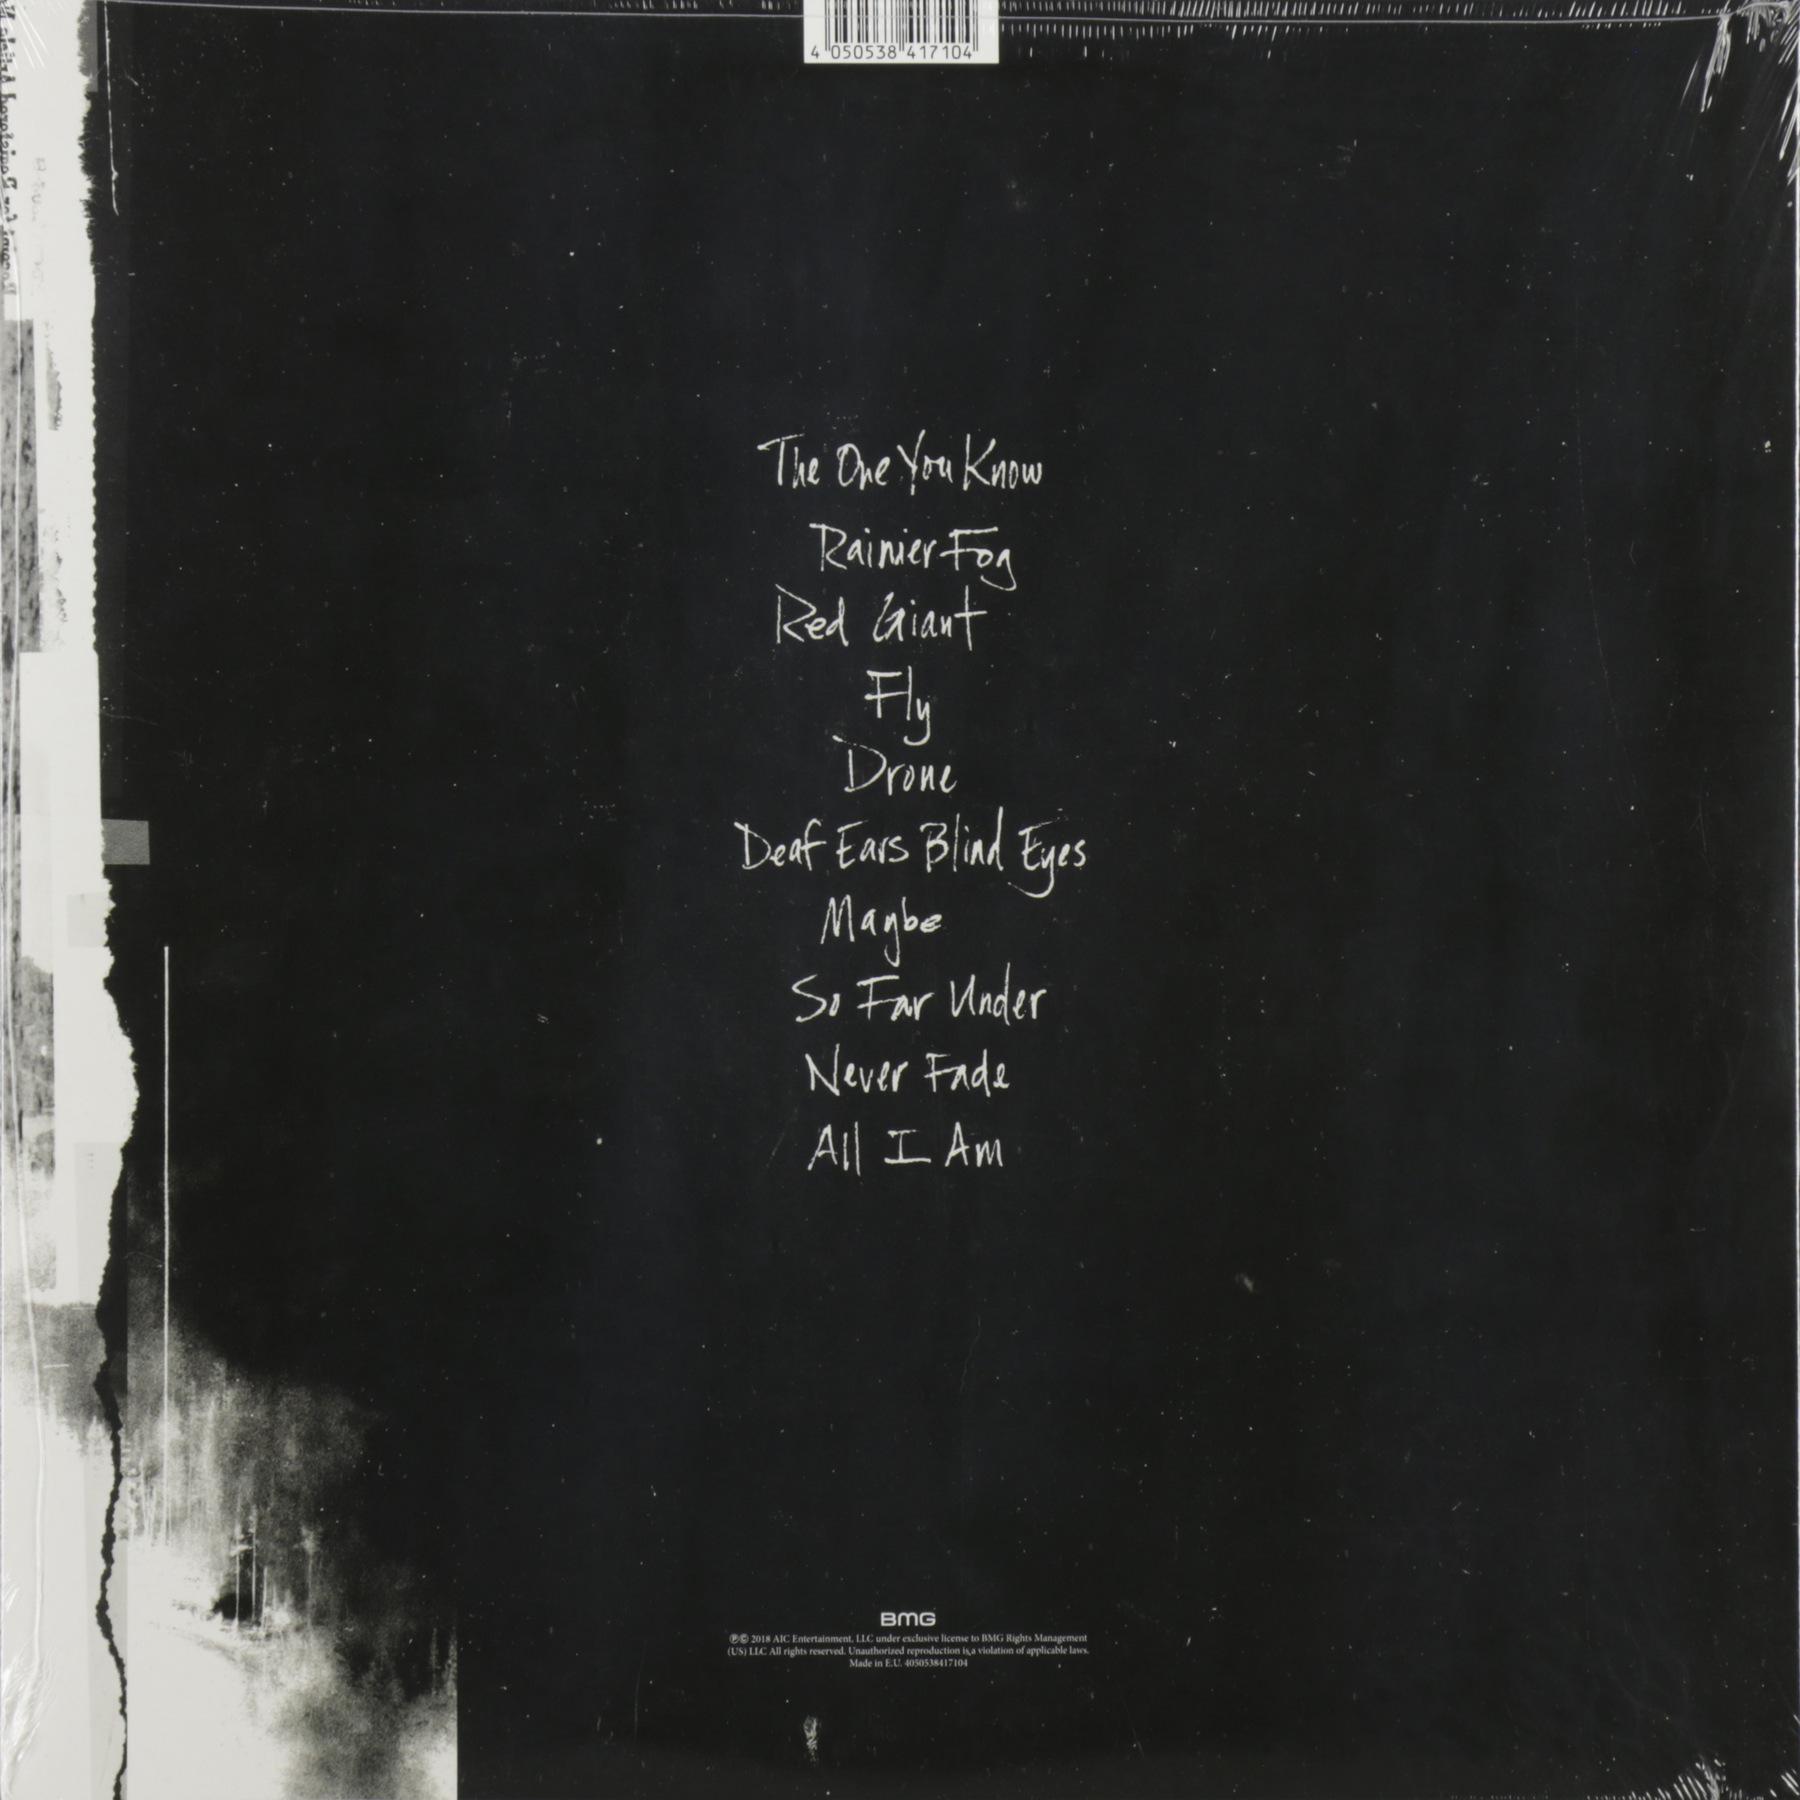 Rainier Fog Alice In Chains: RAINIER FOG (2 LP), купить виниловую